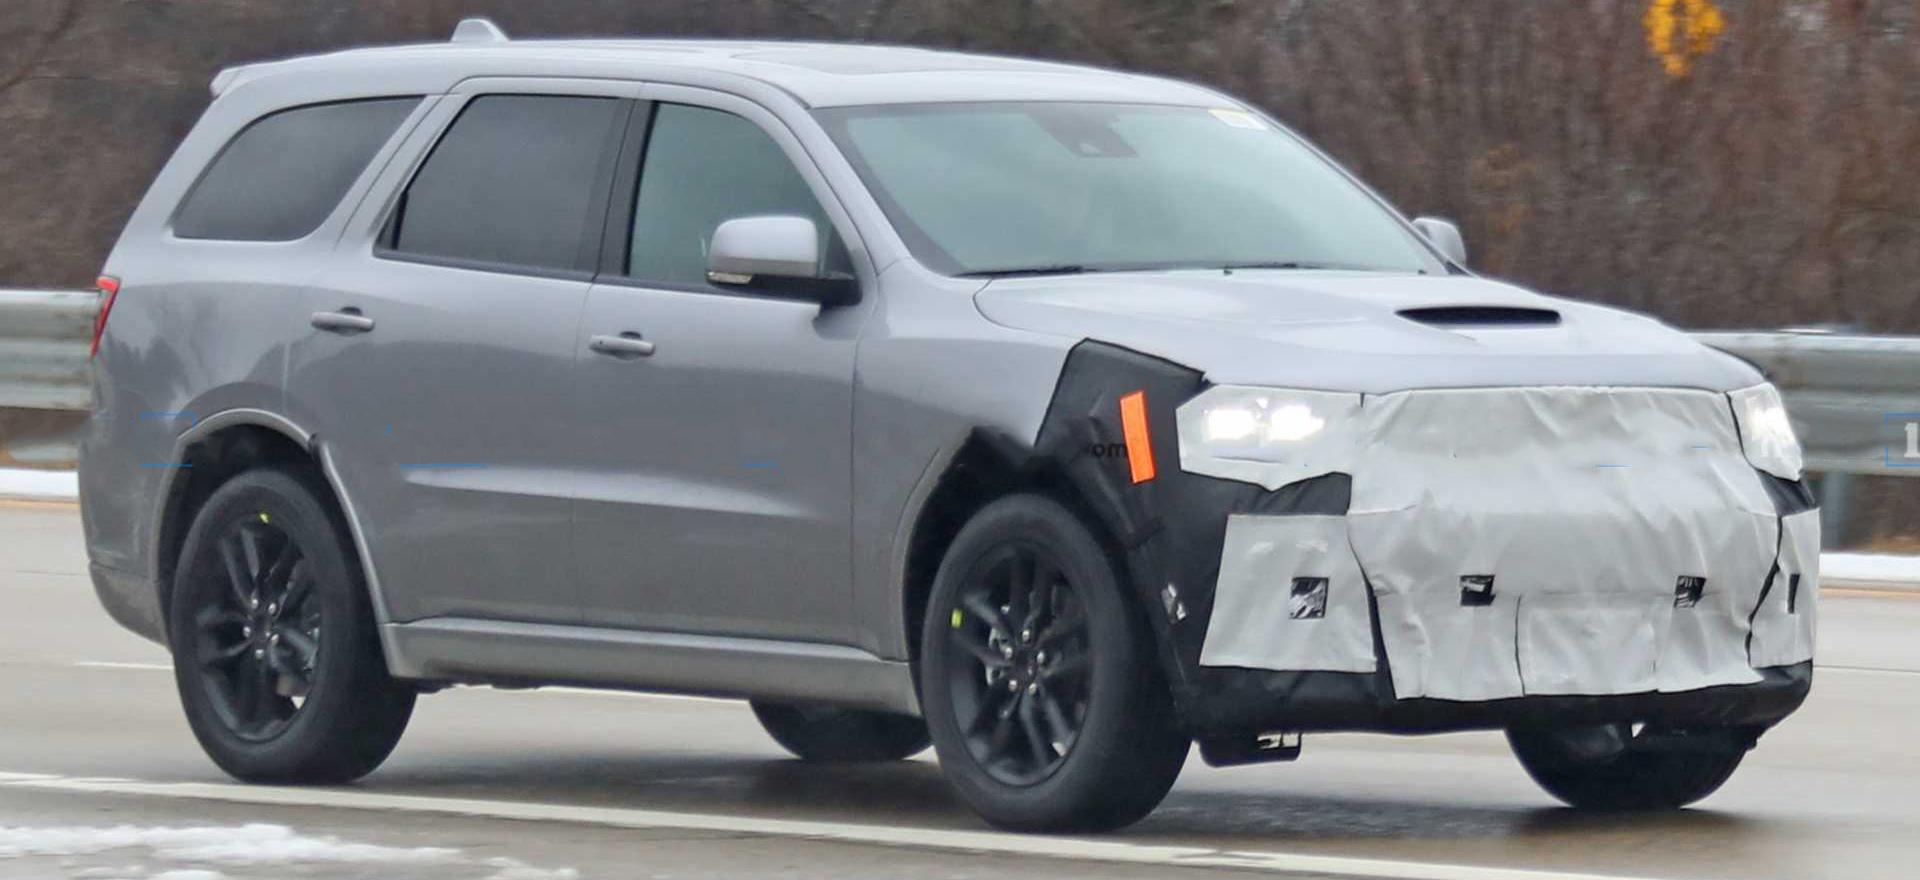 2021 Dodge Durango Spied Images